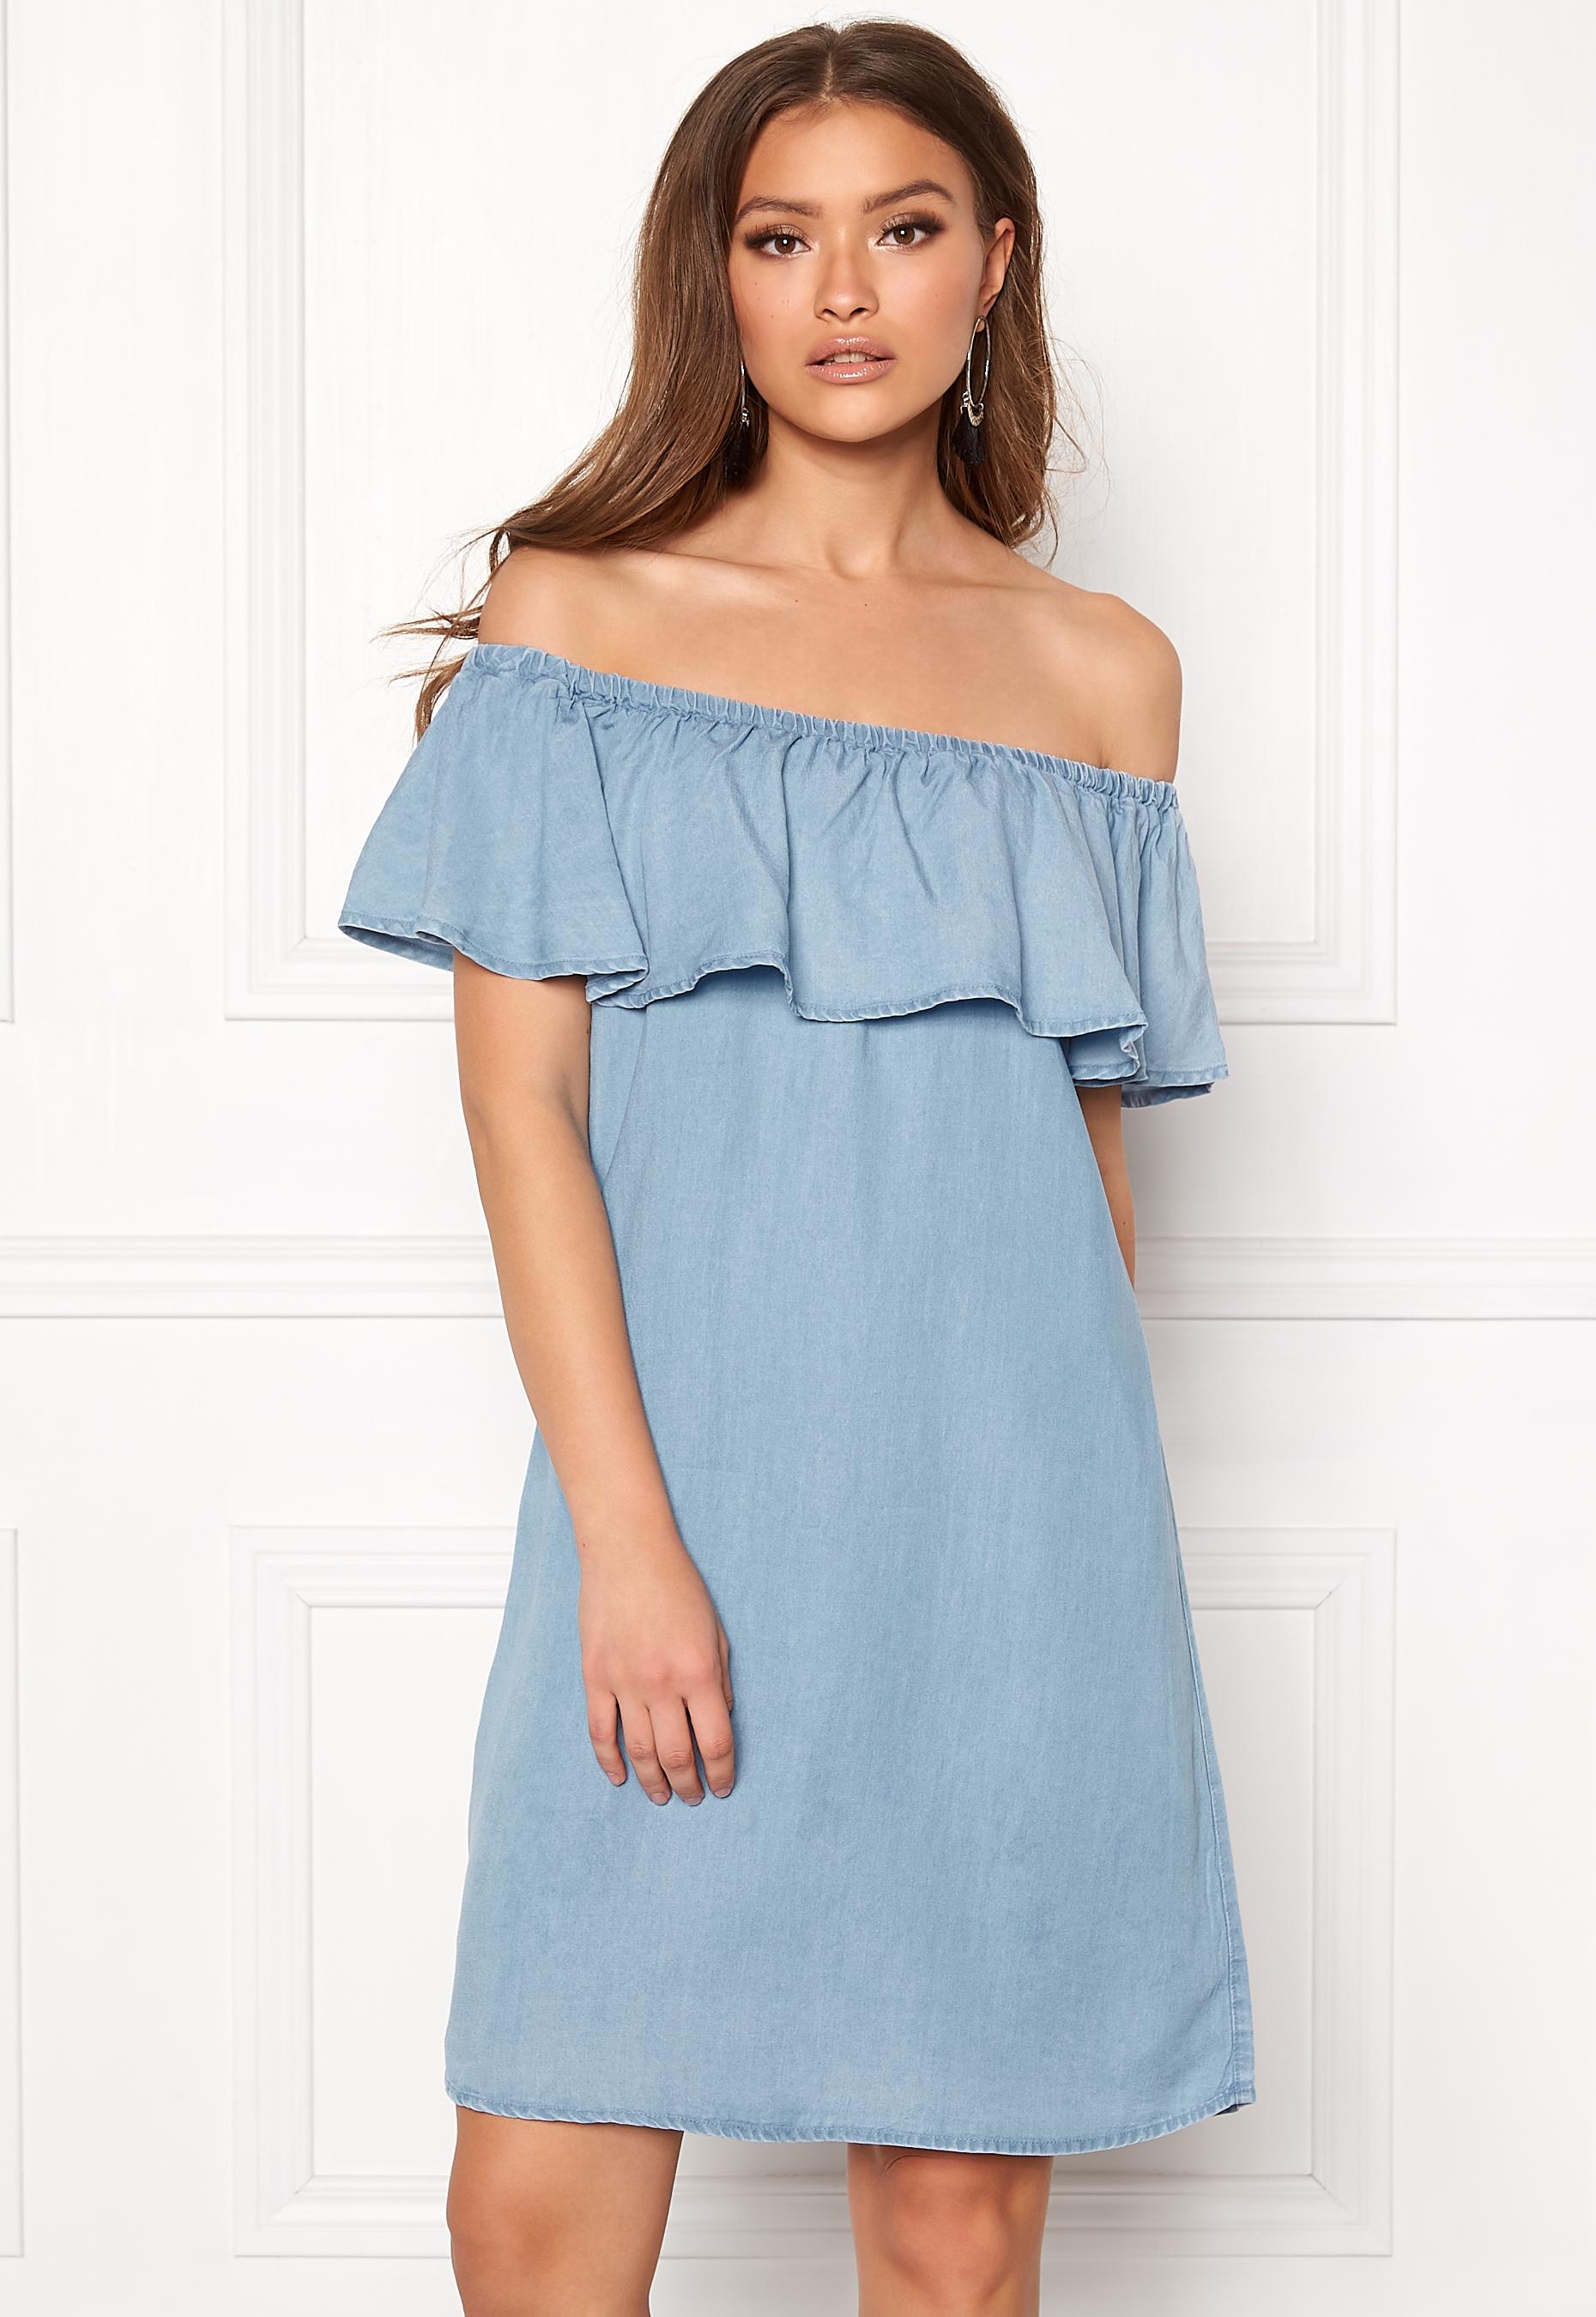 48f0858e9474 VILA Gia Off Shoulder Dress Light Blue Denim - Bubbleroom